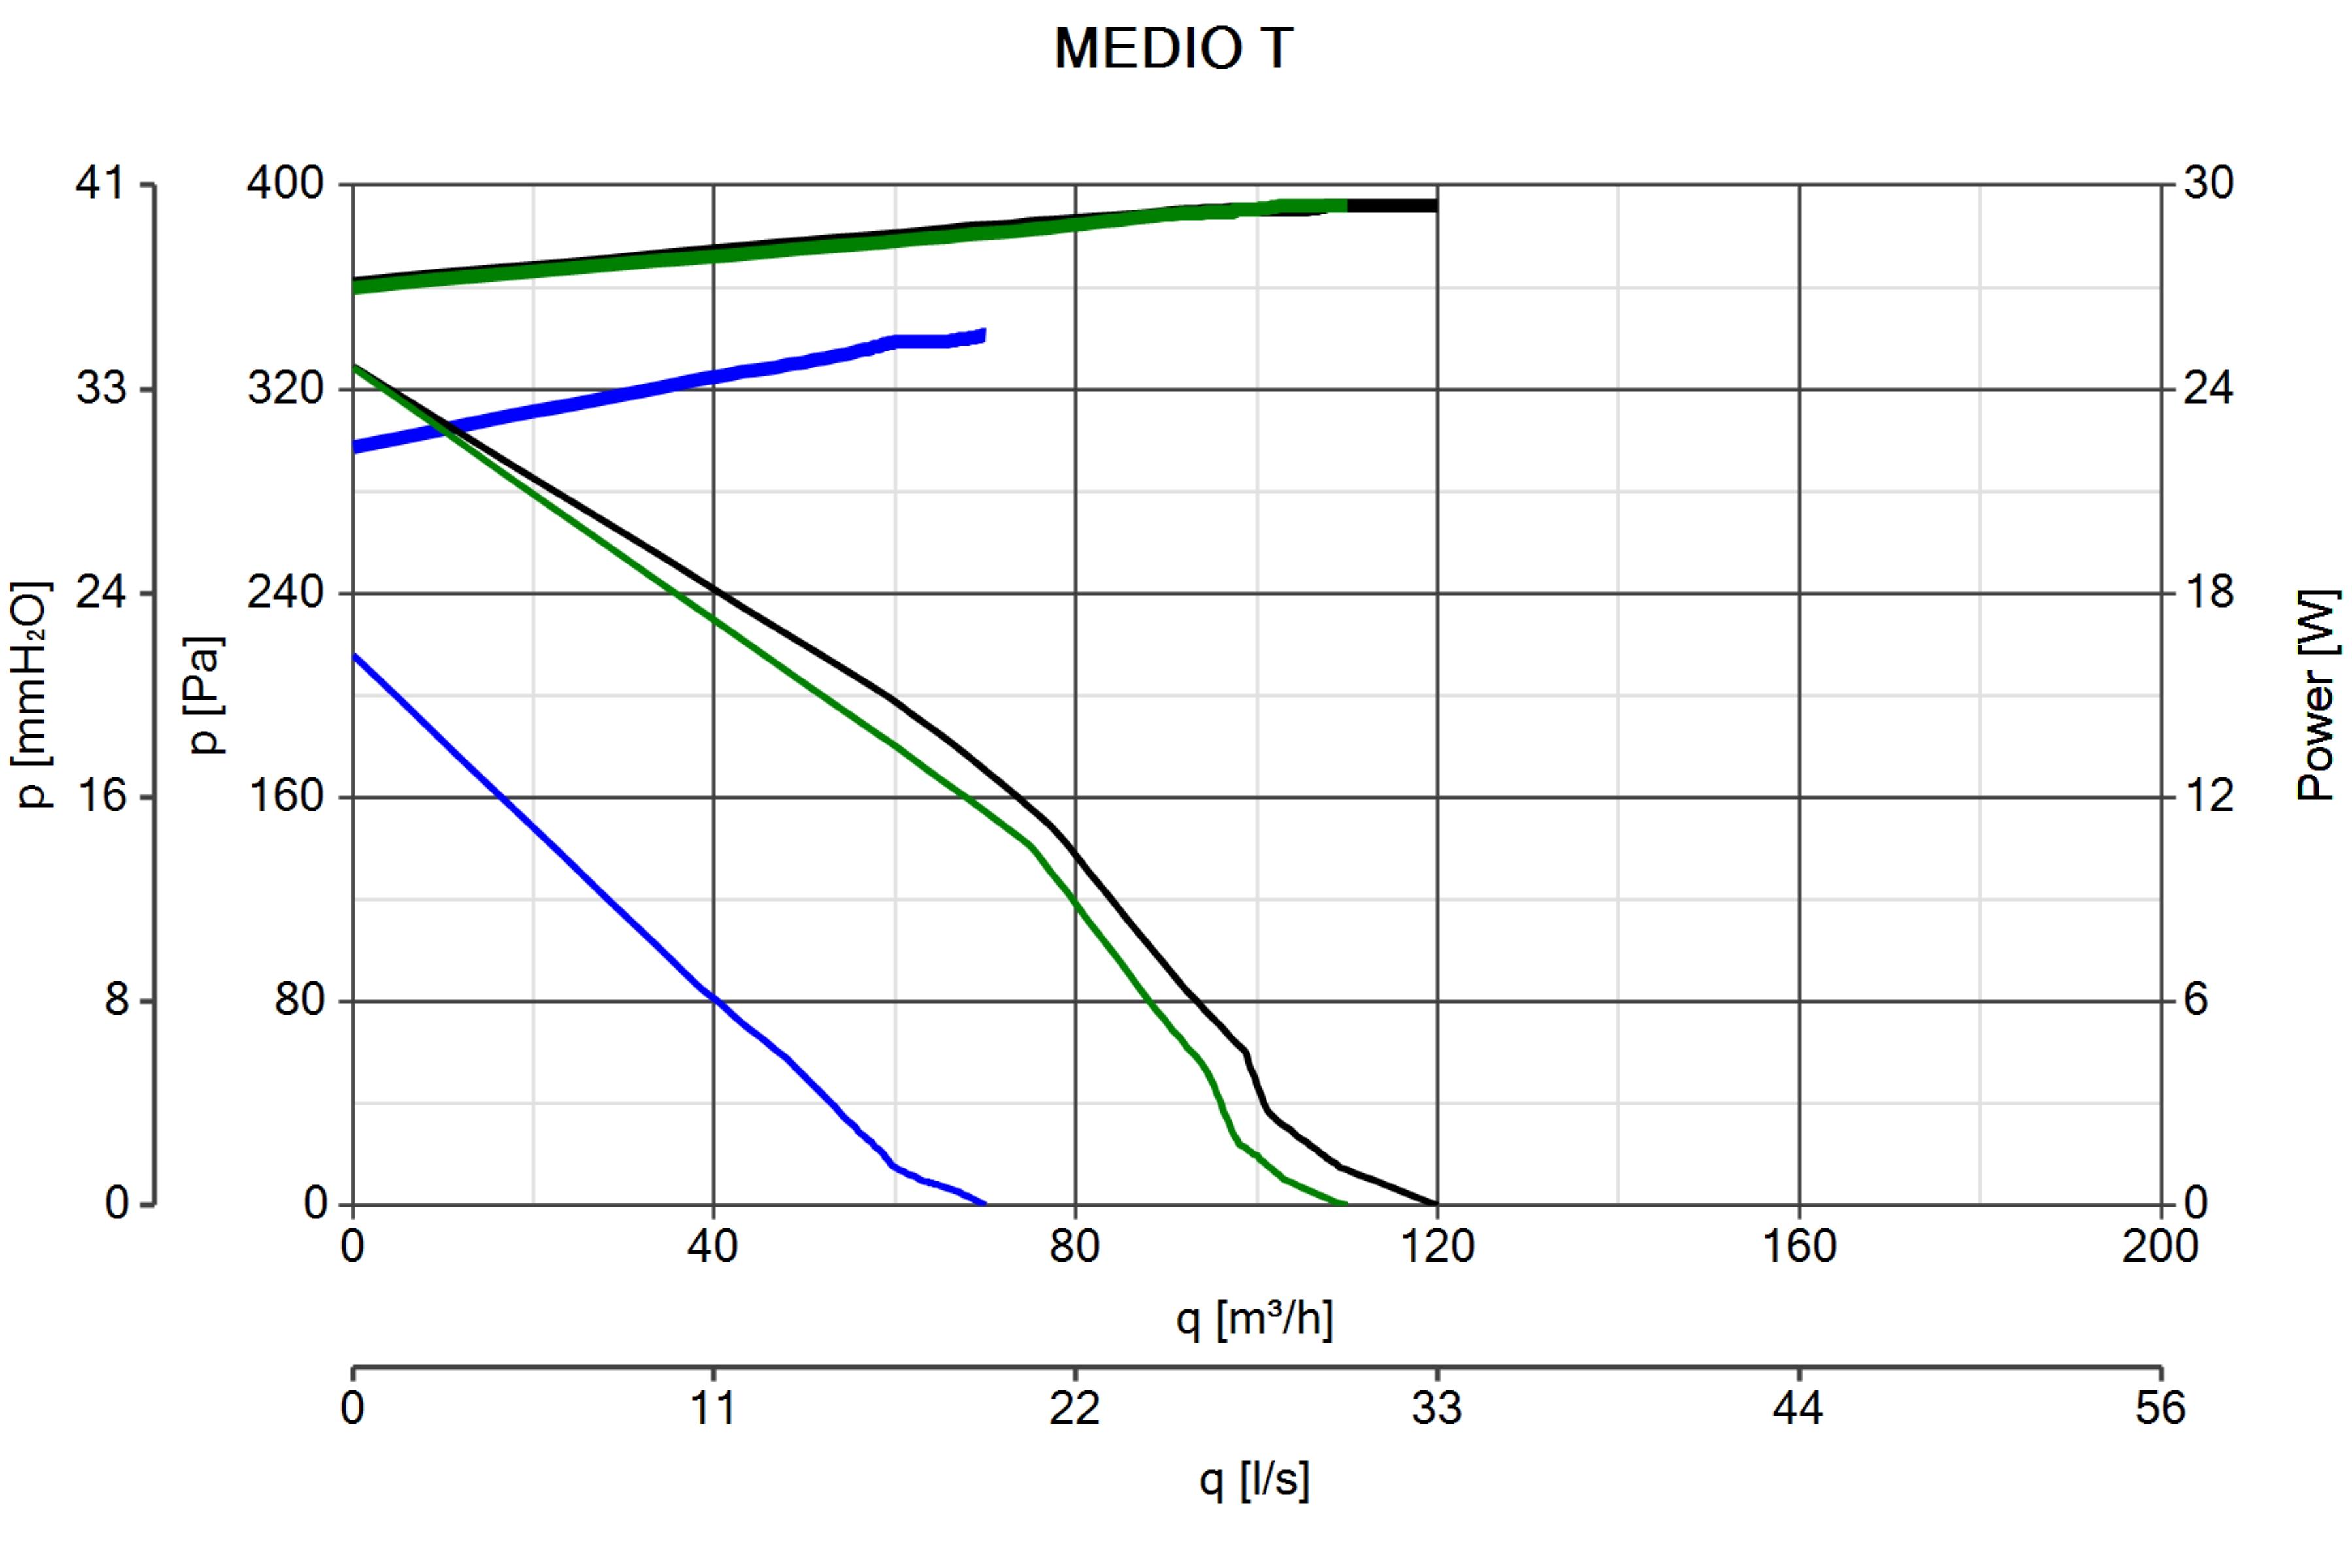 Medio T Residential Ventilation Centrifugal Fans Vortice Fan Wiring Diagram 138